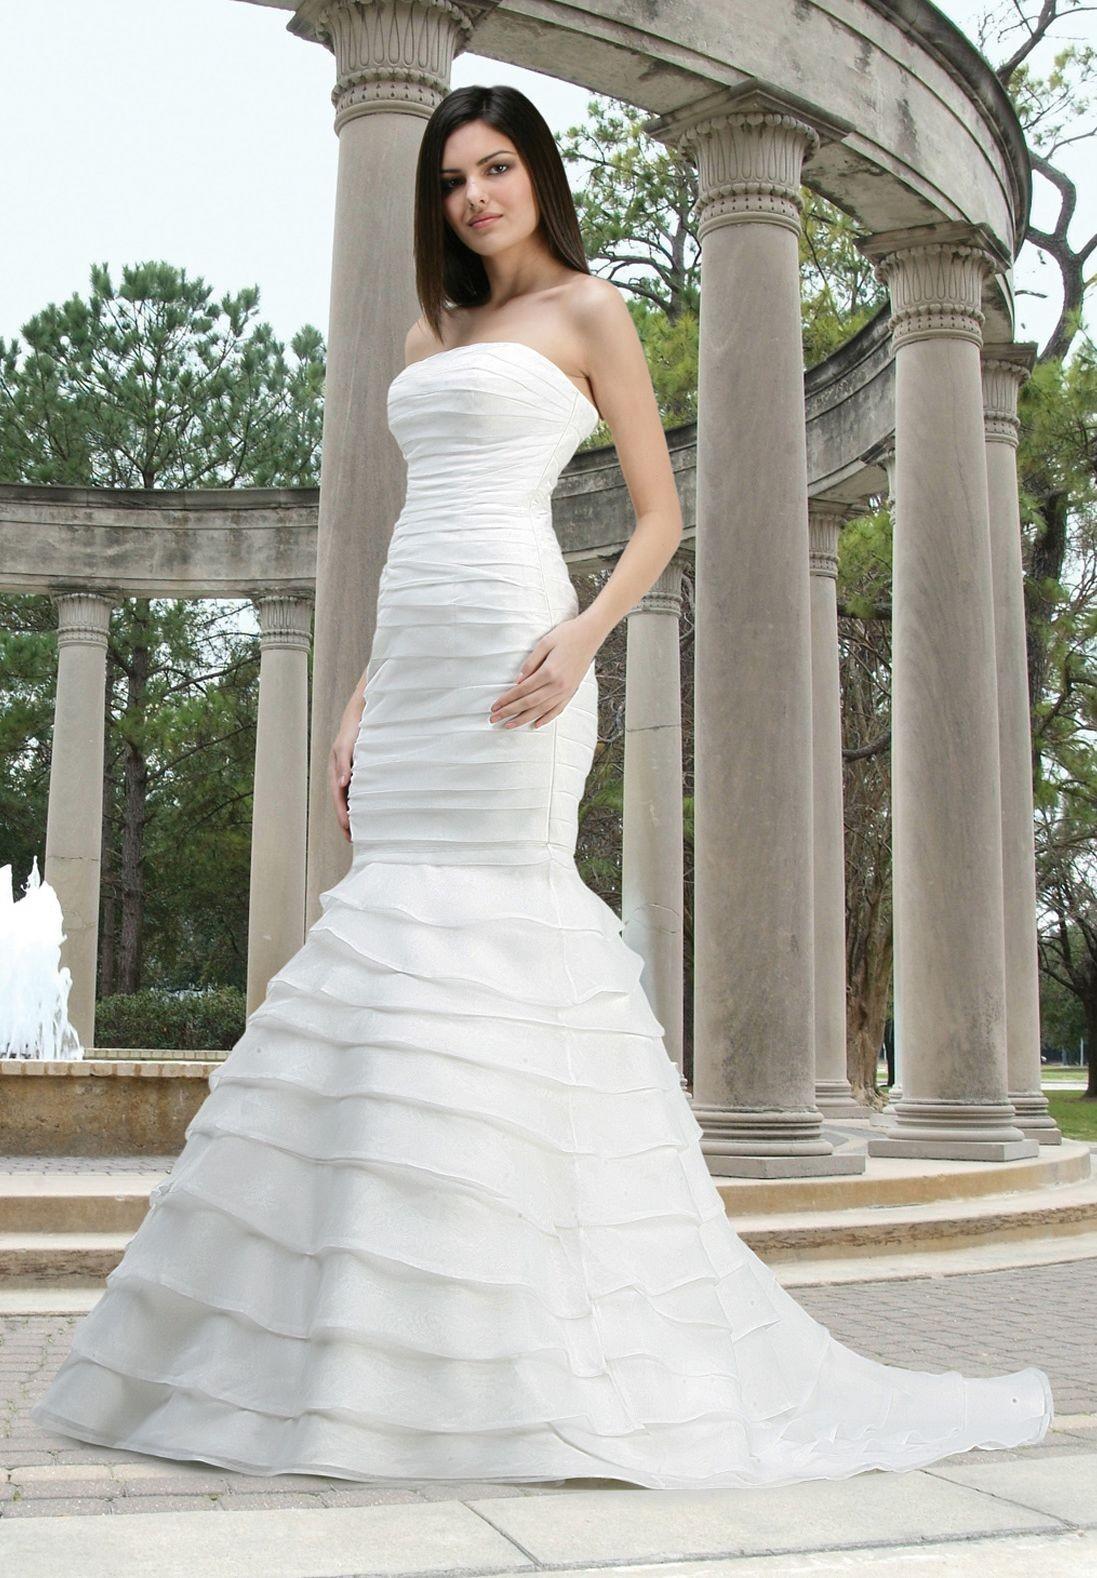 white strapless wedding dresses wedding dresses strapless sophisticated strapless wedding dresses